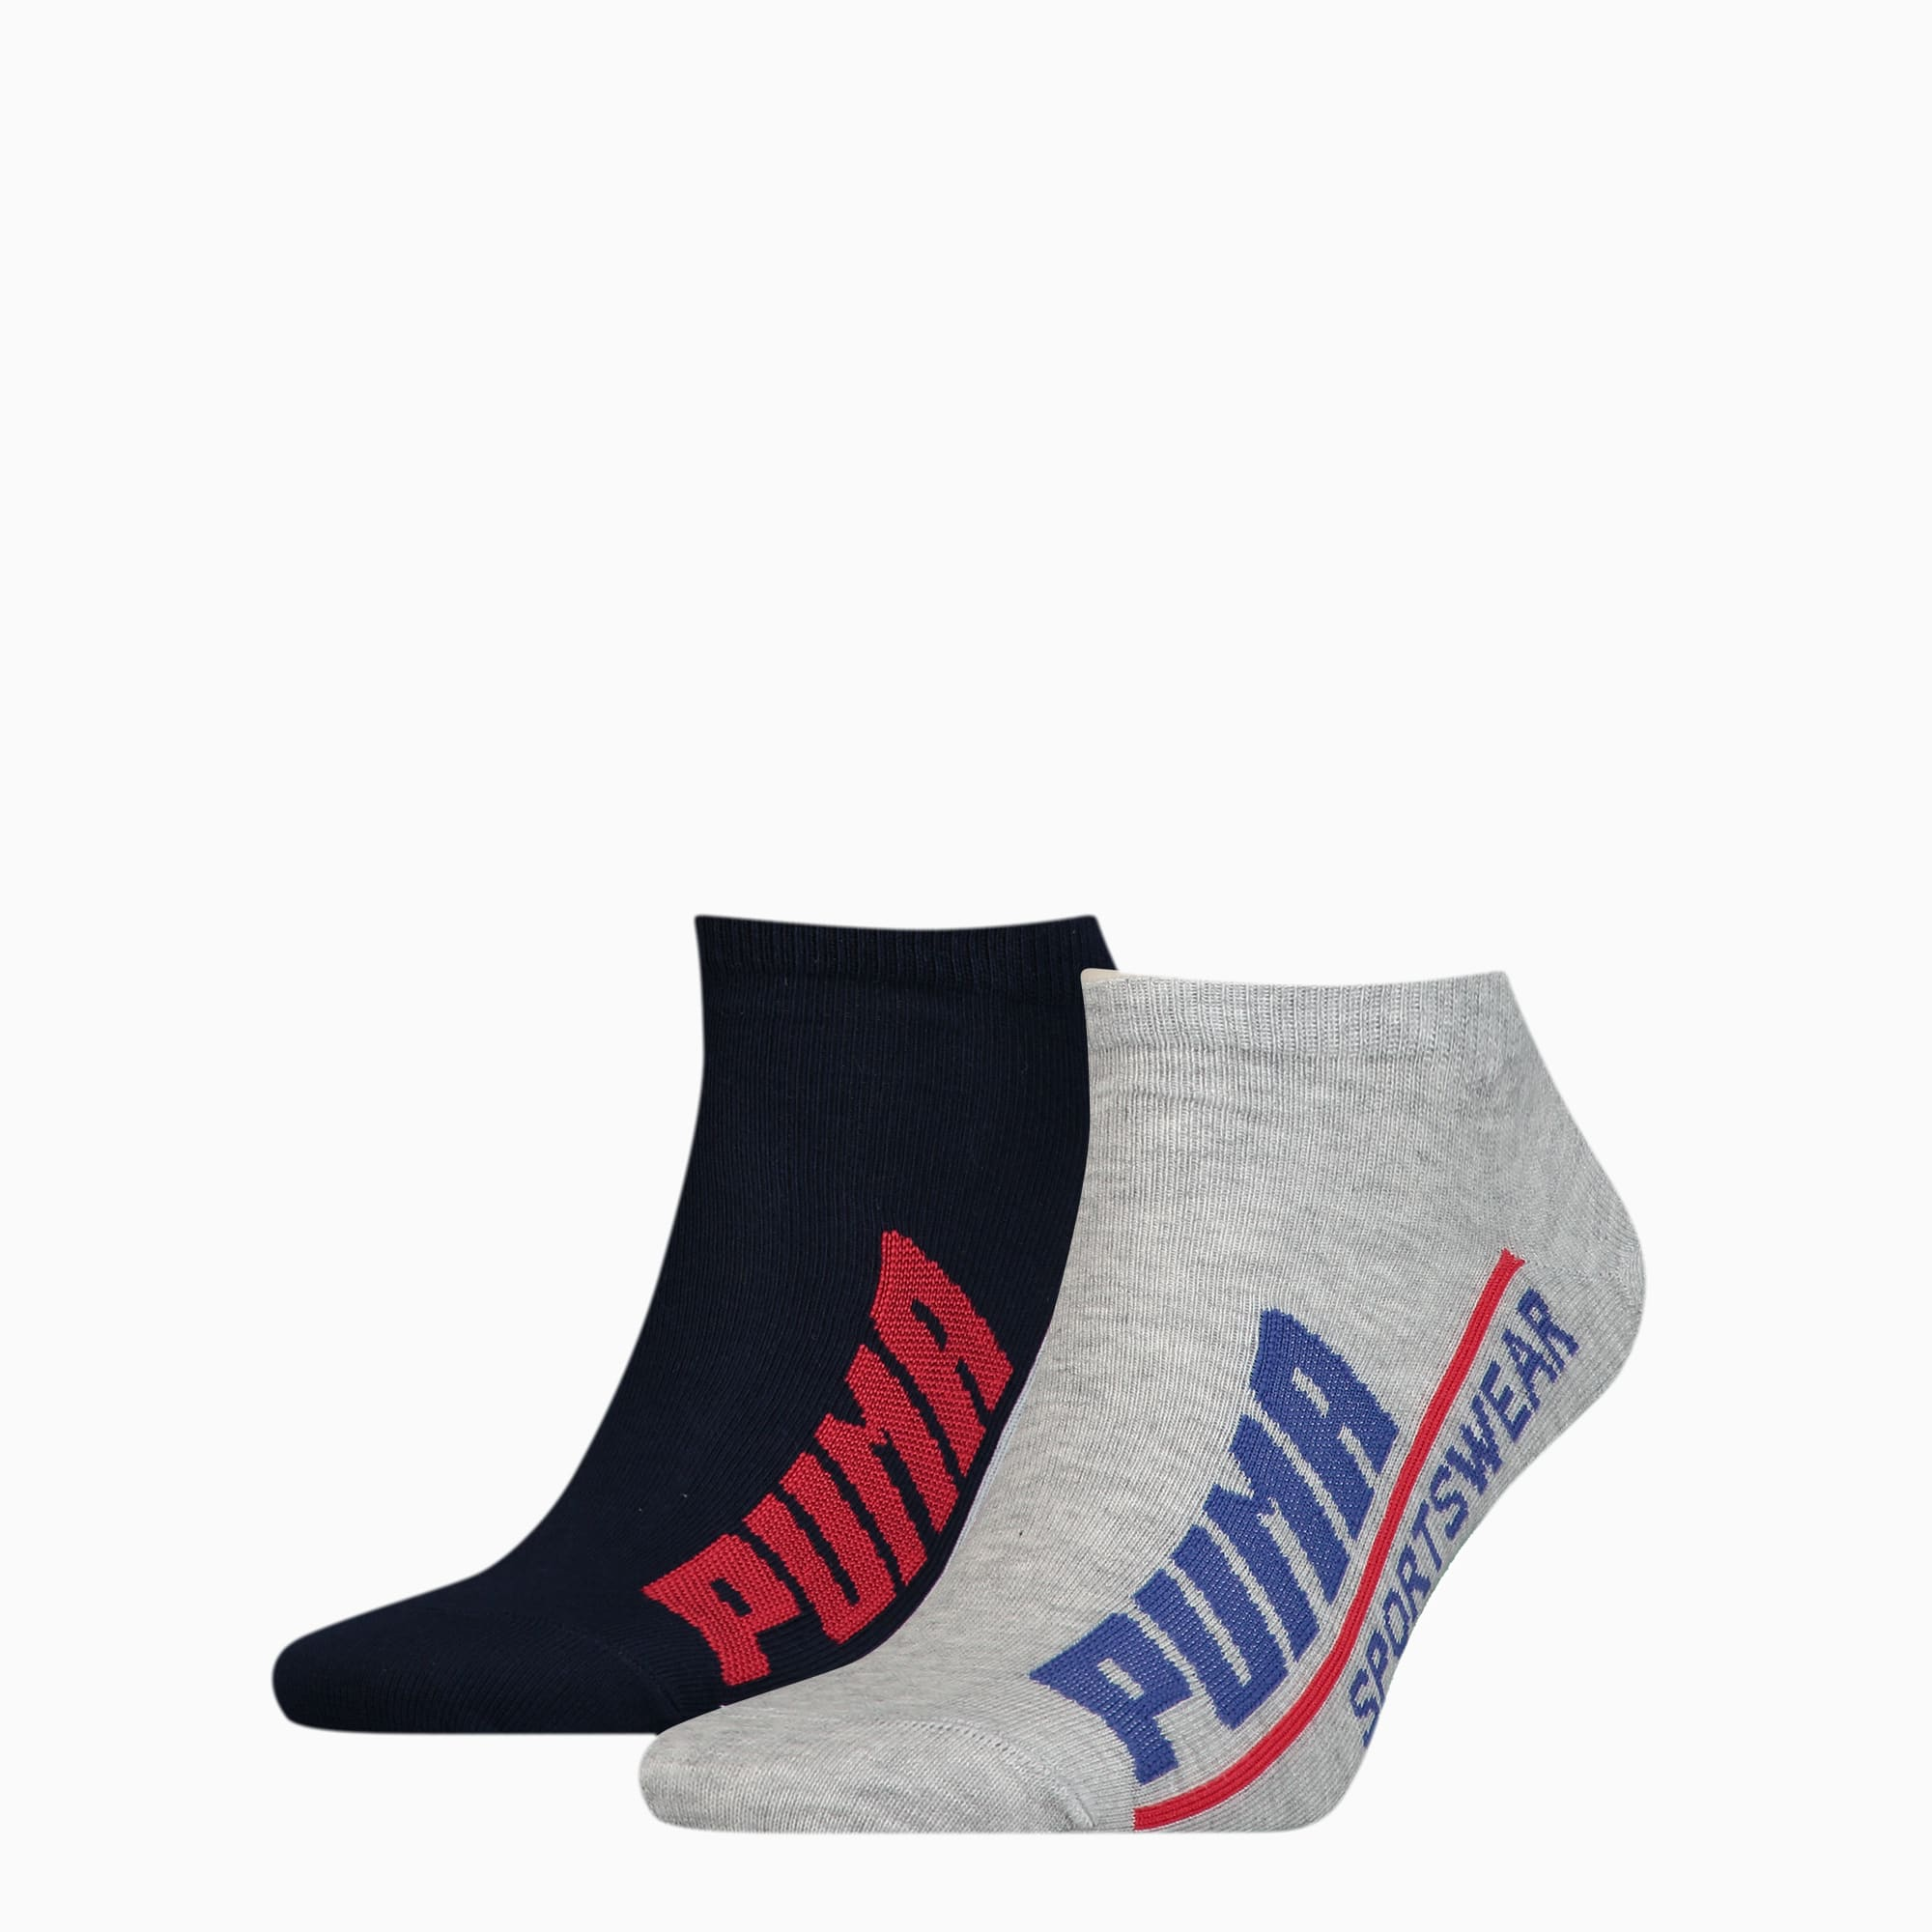 puma calza sneaker uomo